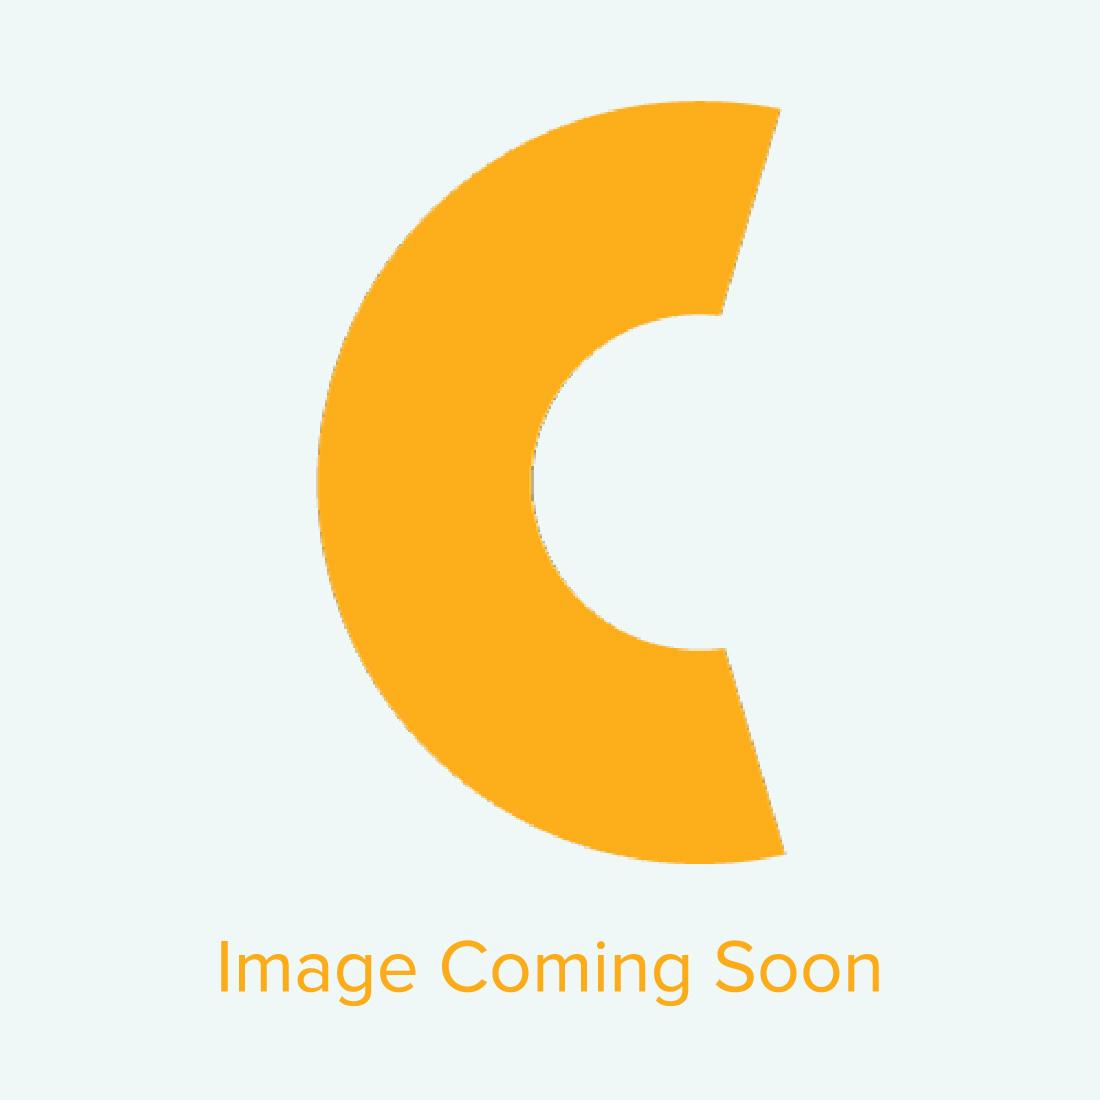 "ChromaLuxe Sublimation Aluminum Metal Photo Print Panel - 40"" x 60"" - 3 pack - White"